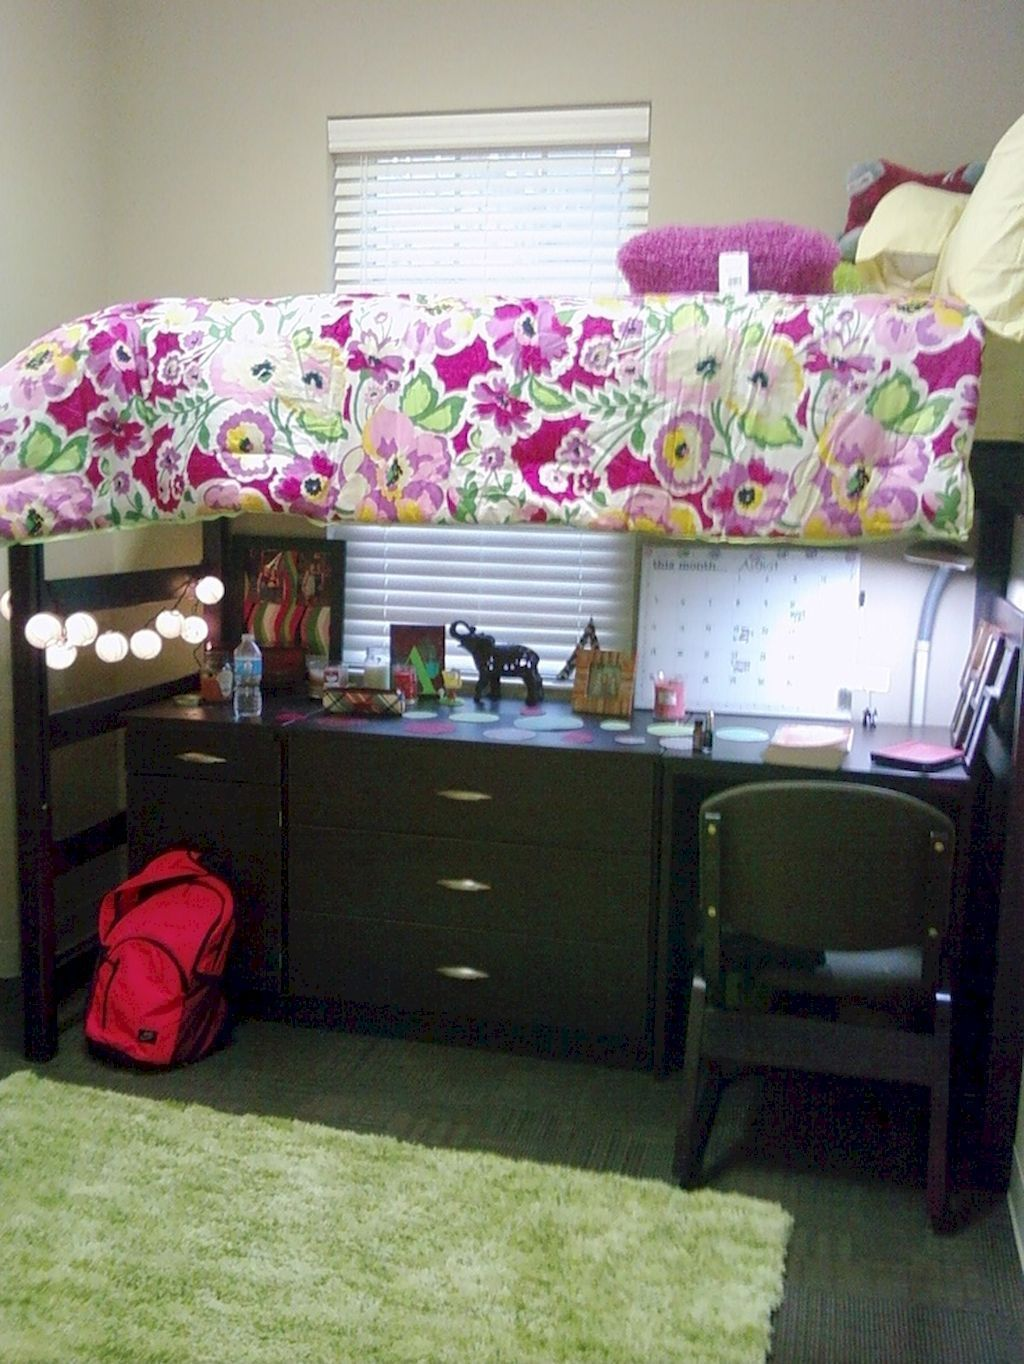 College loft bed ideas   cute loft beds college dorm room design ideas for girl